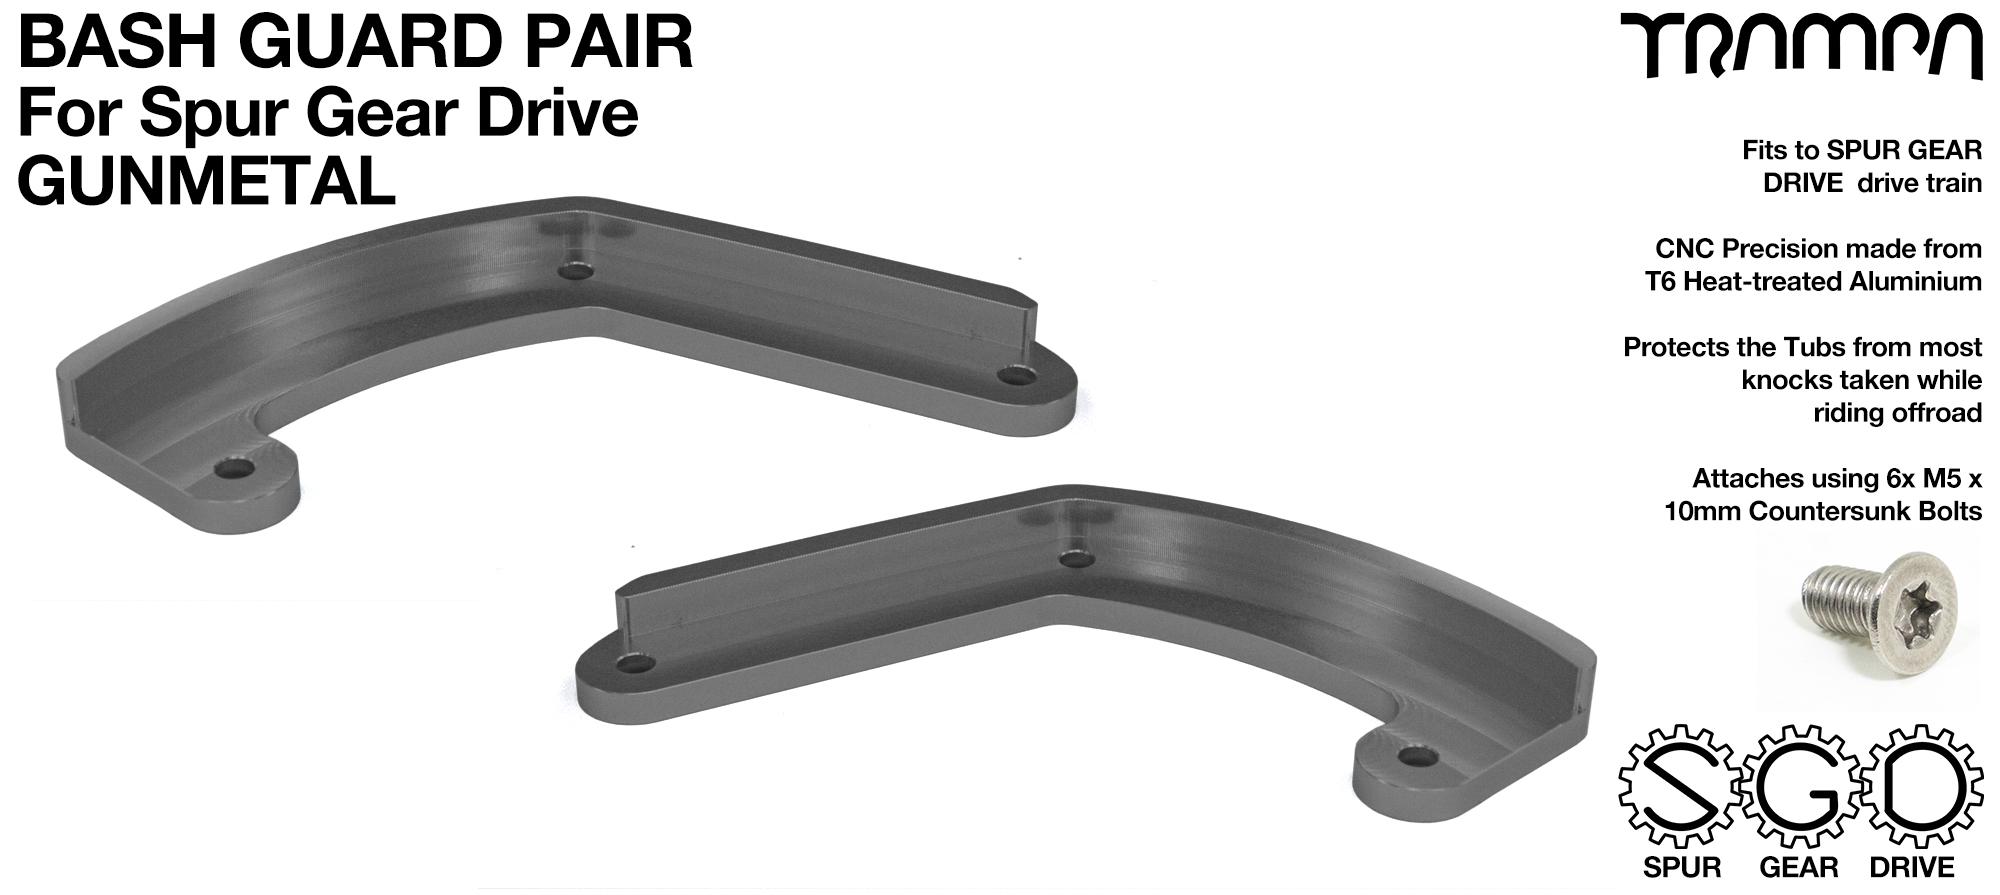 MkII Spur Gear Drive Bash Guards PAIR - GUNMETAL